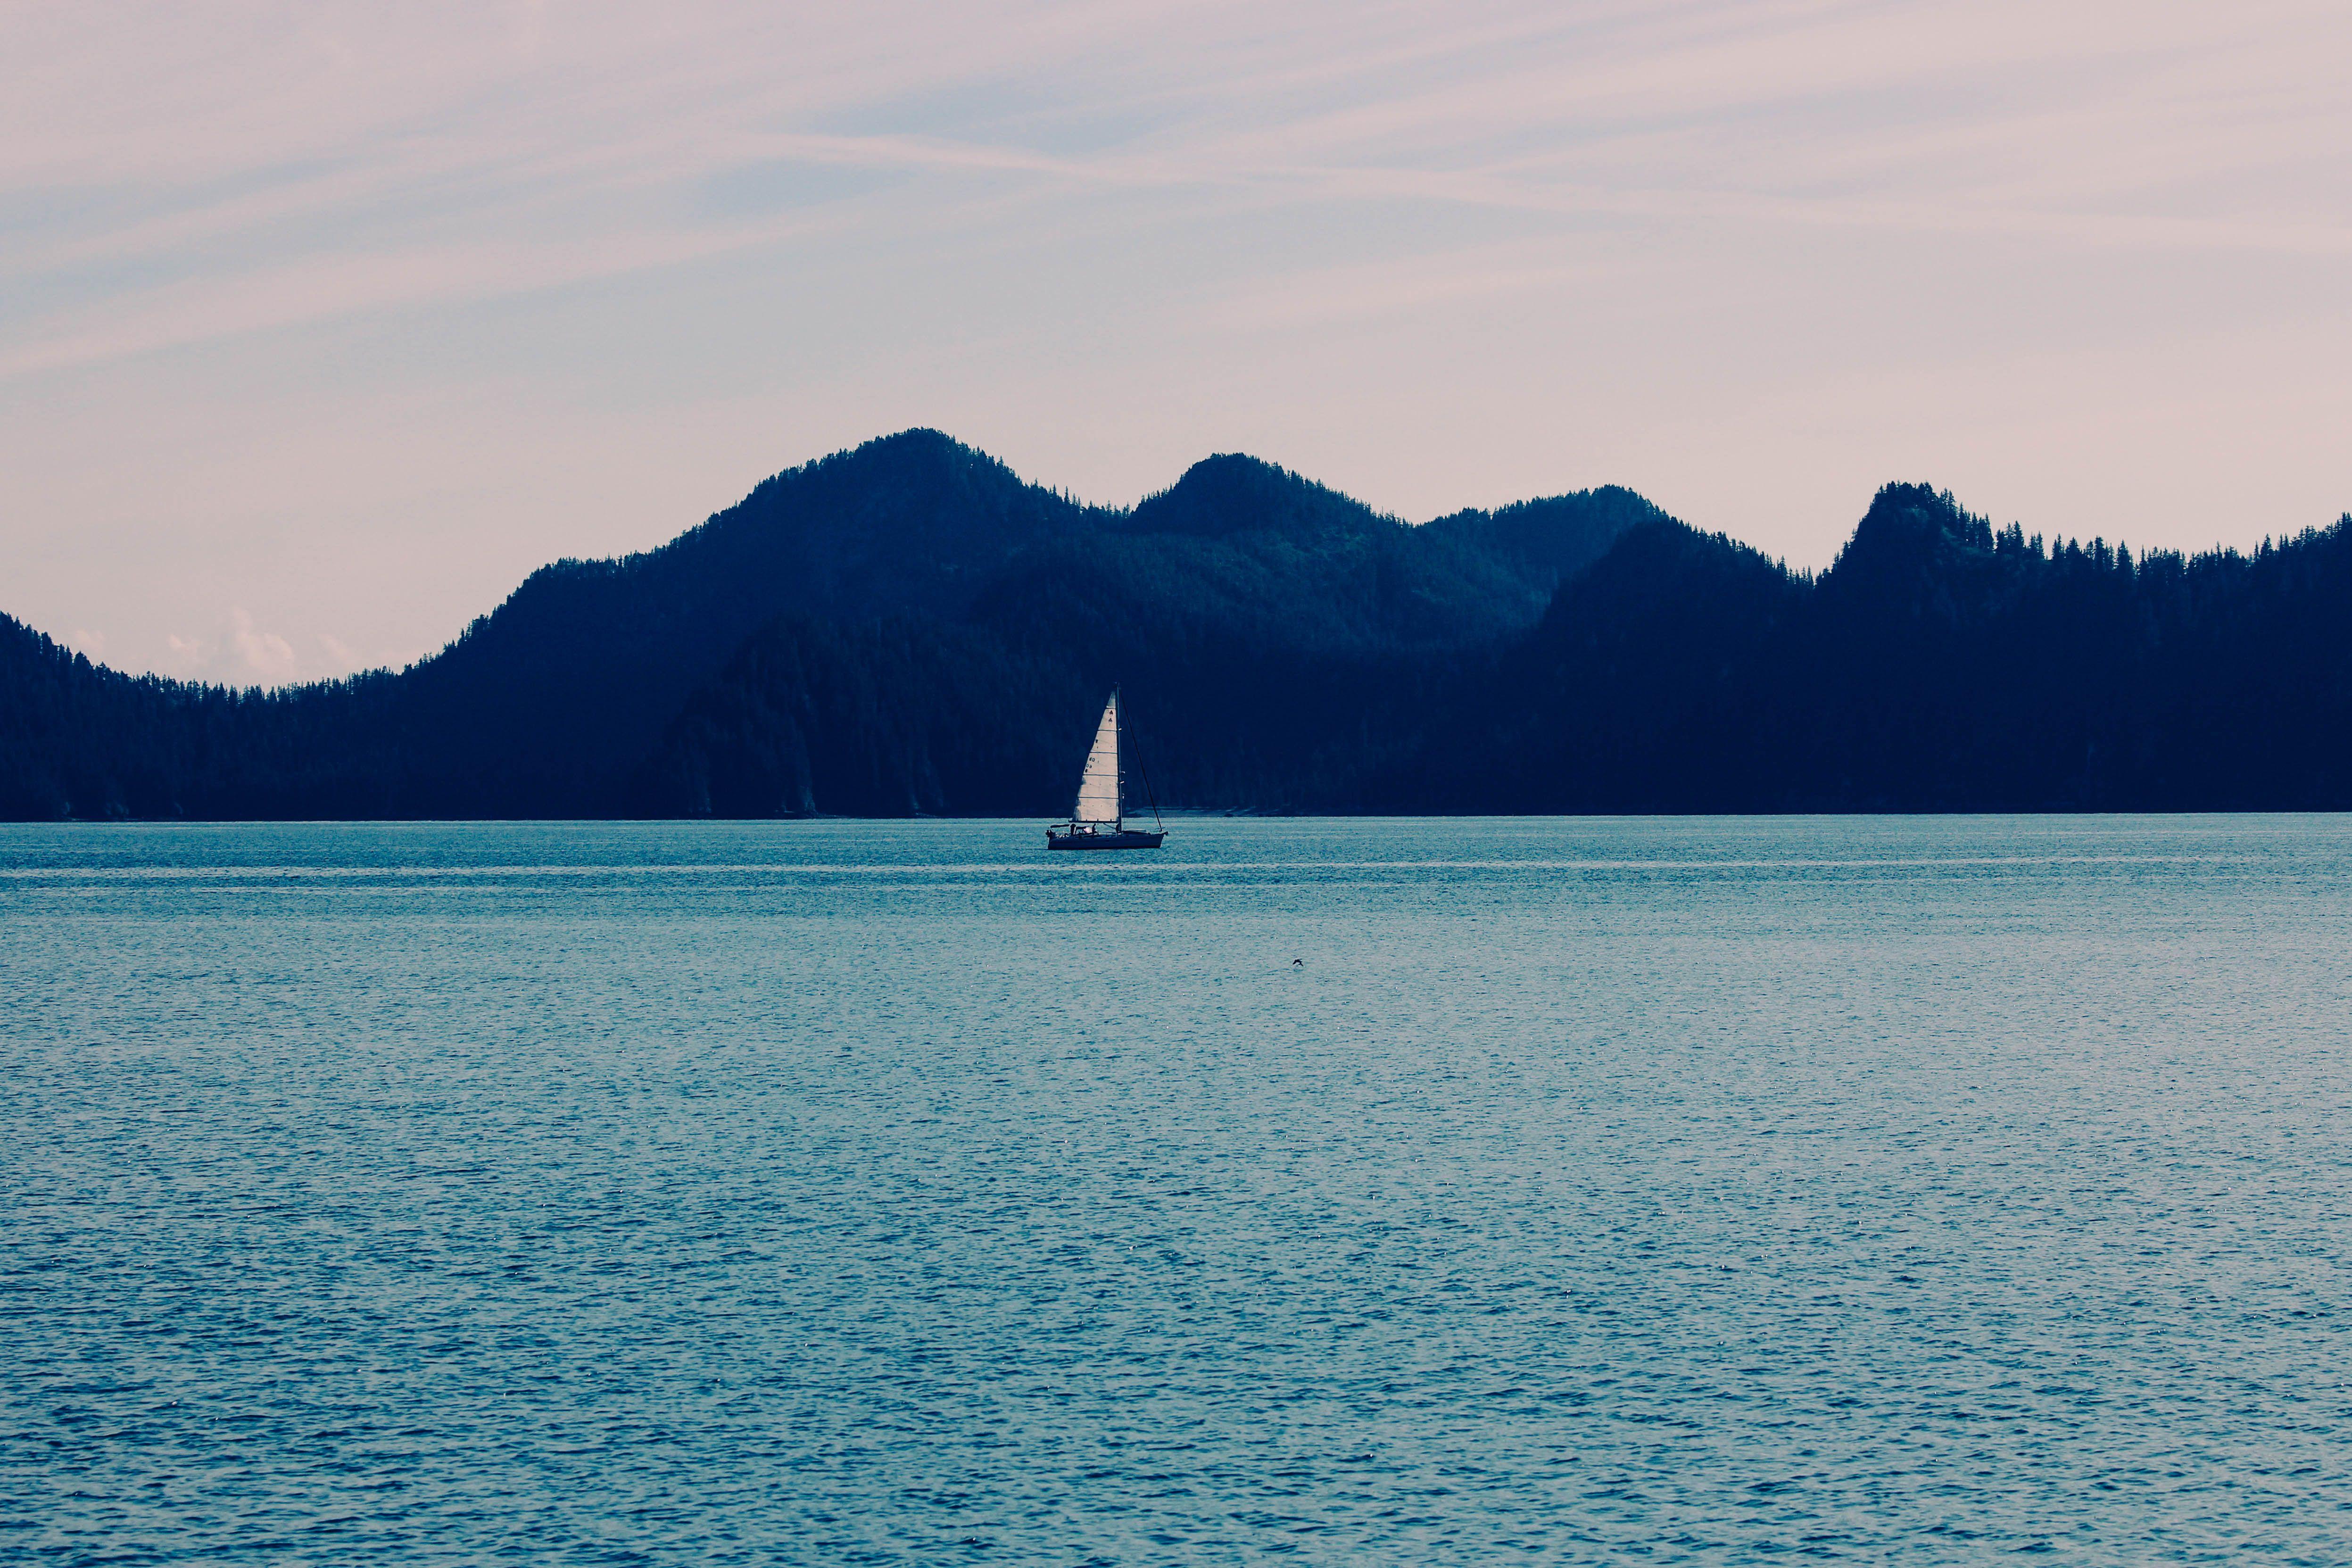 #alaska #seward Off a wildlife cruise